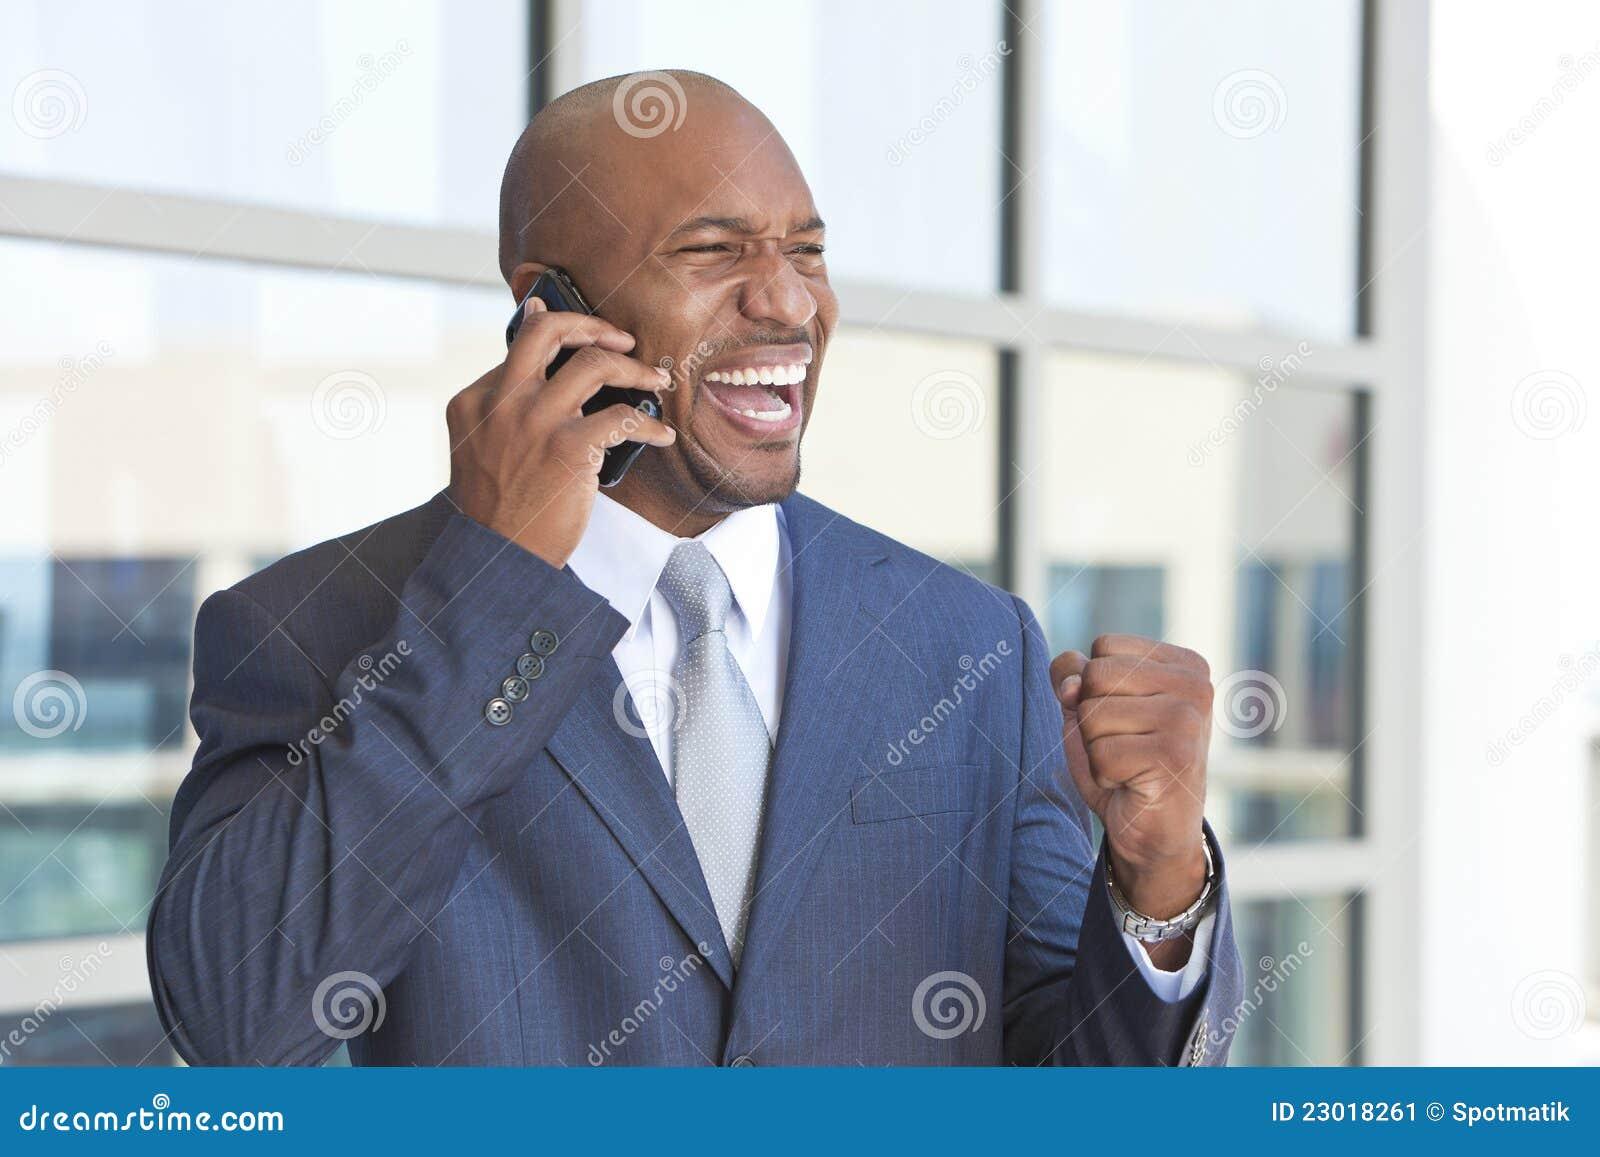 Random american cell phone number